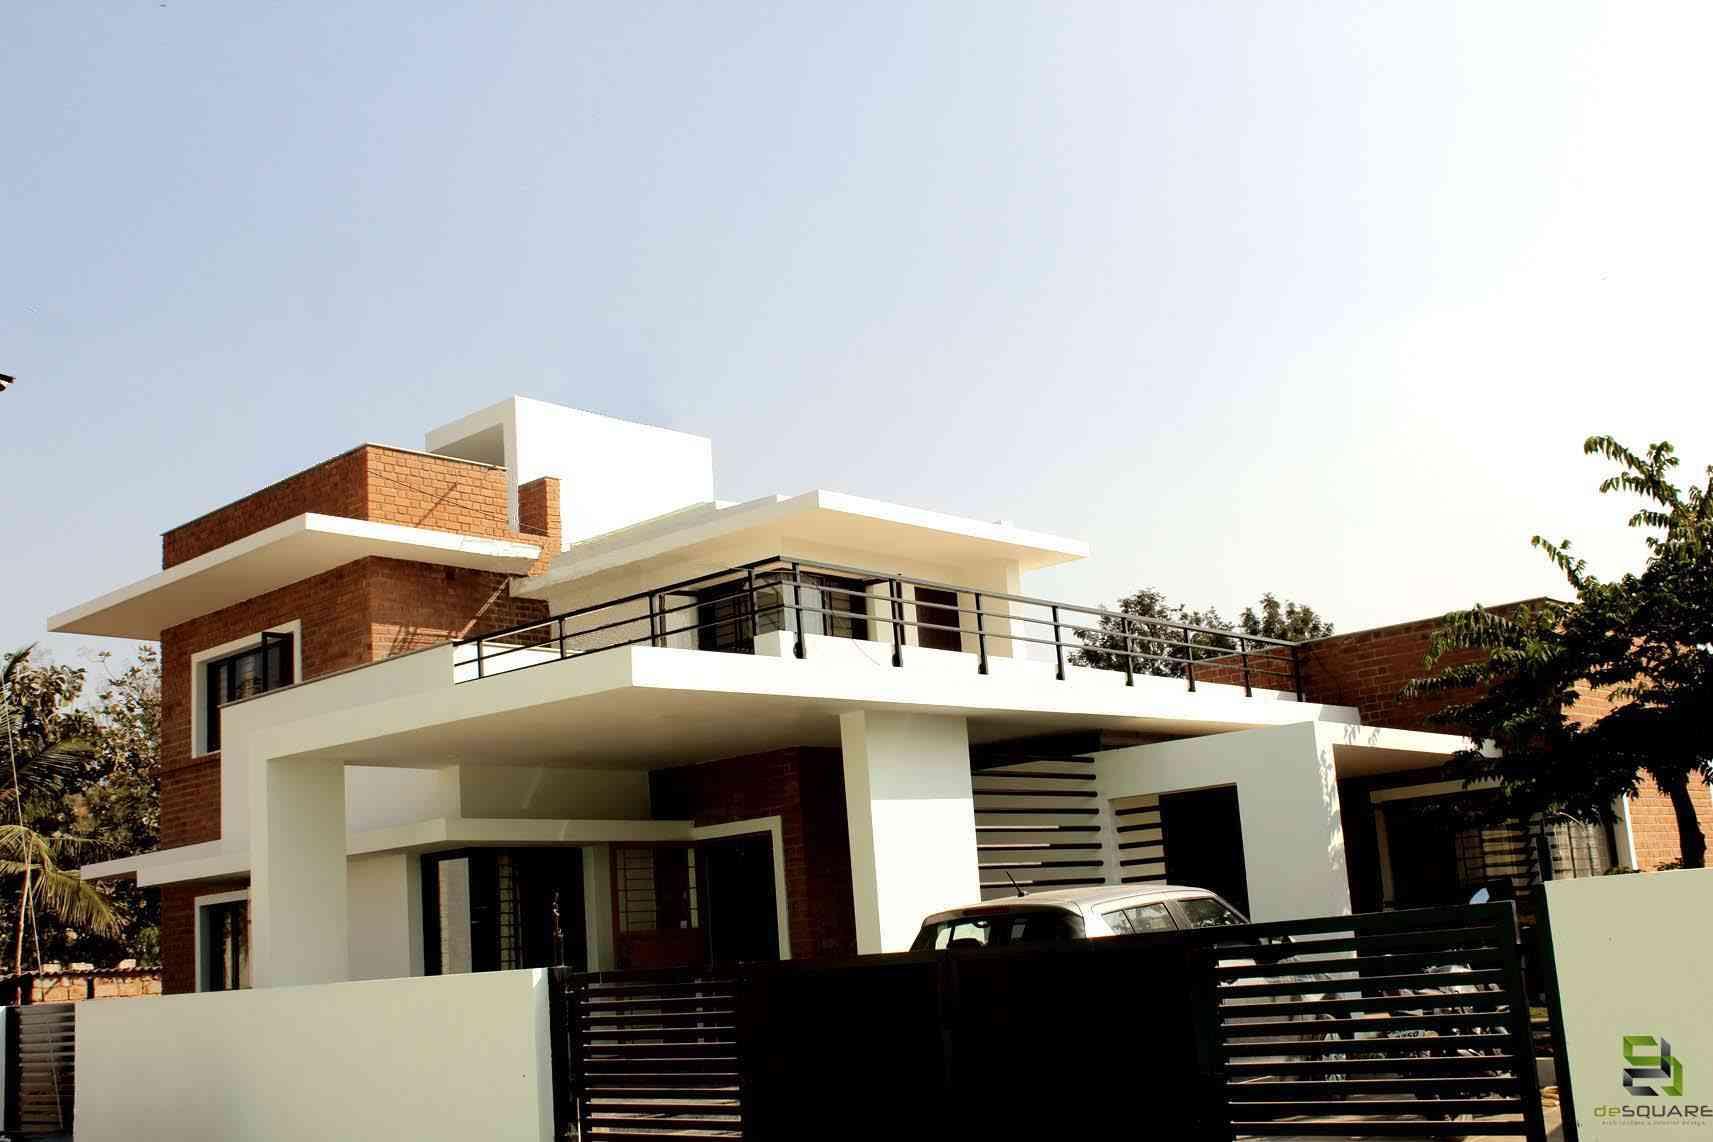 Boundary wall design interior design inspiration for Modern house designs in punjab